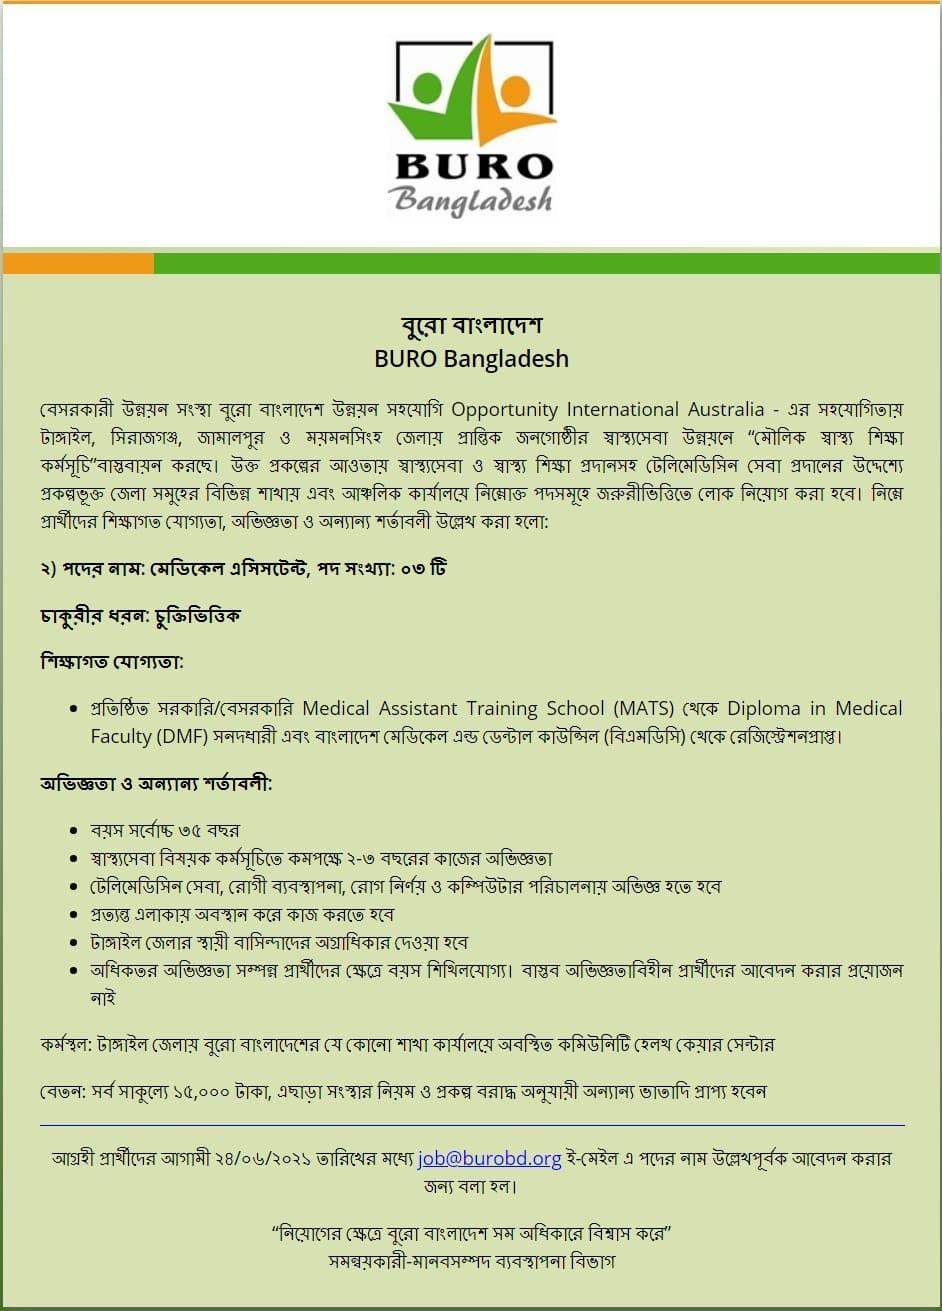 bangladesh BURO Job Circular 2021